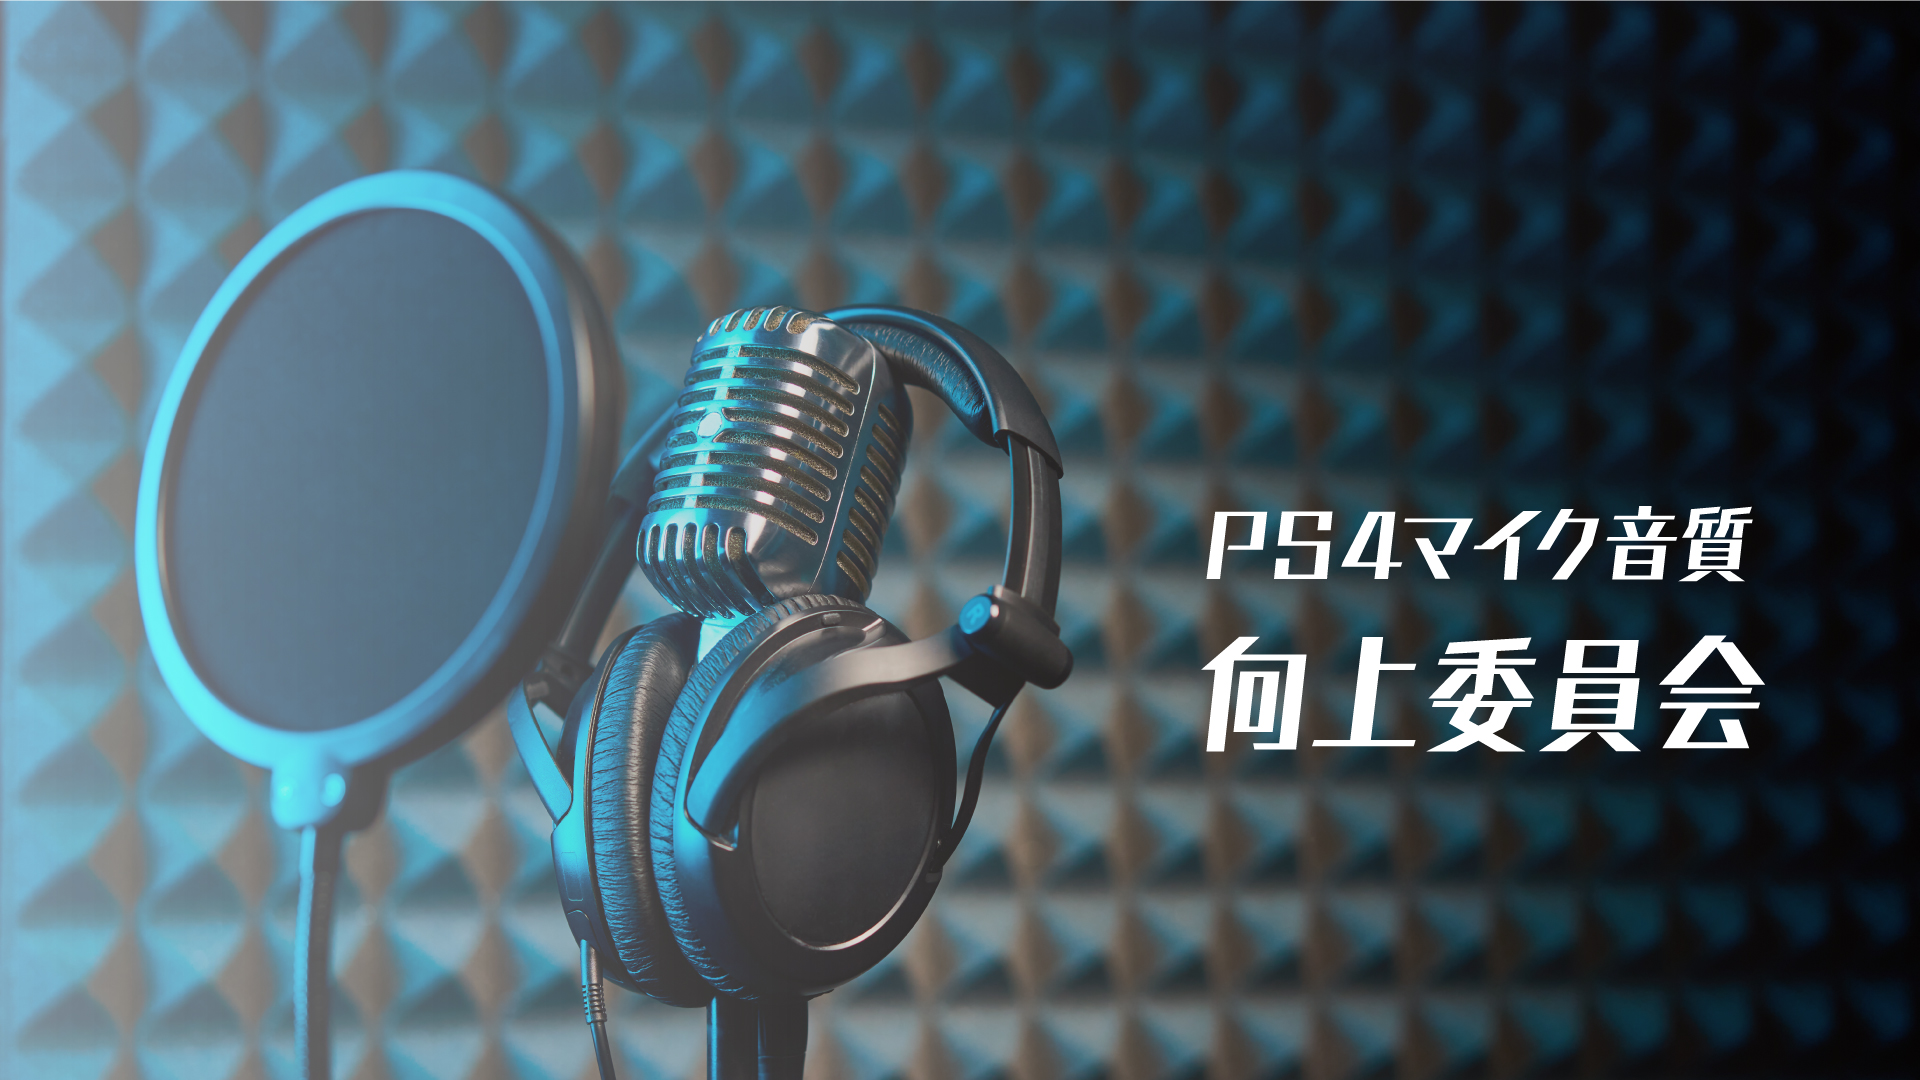 PS4 ボイスチャット(VC)向上委員会 【Tips】